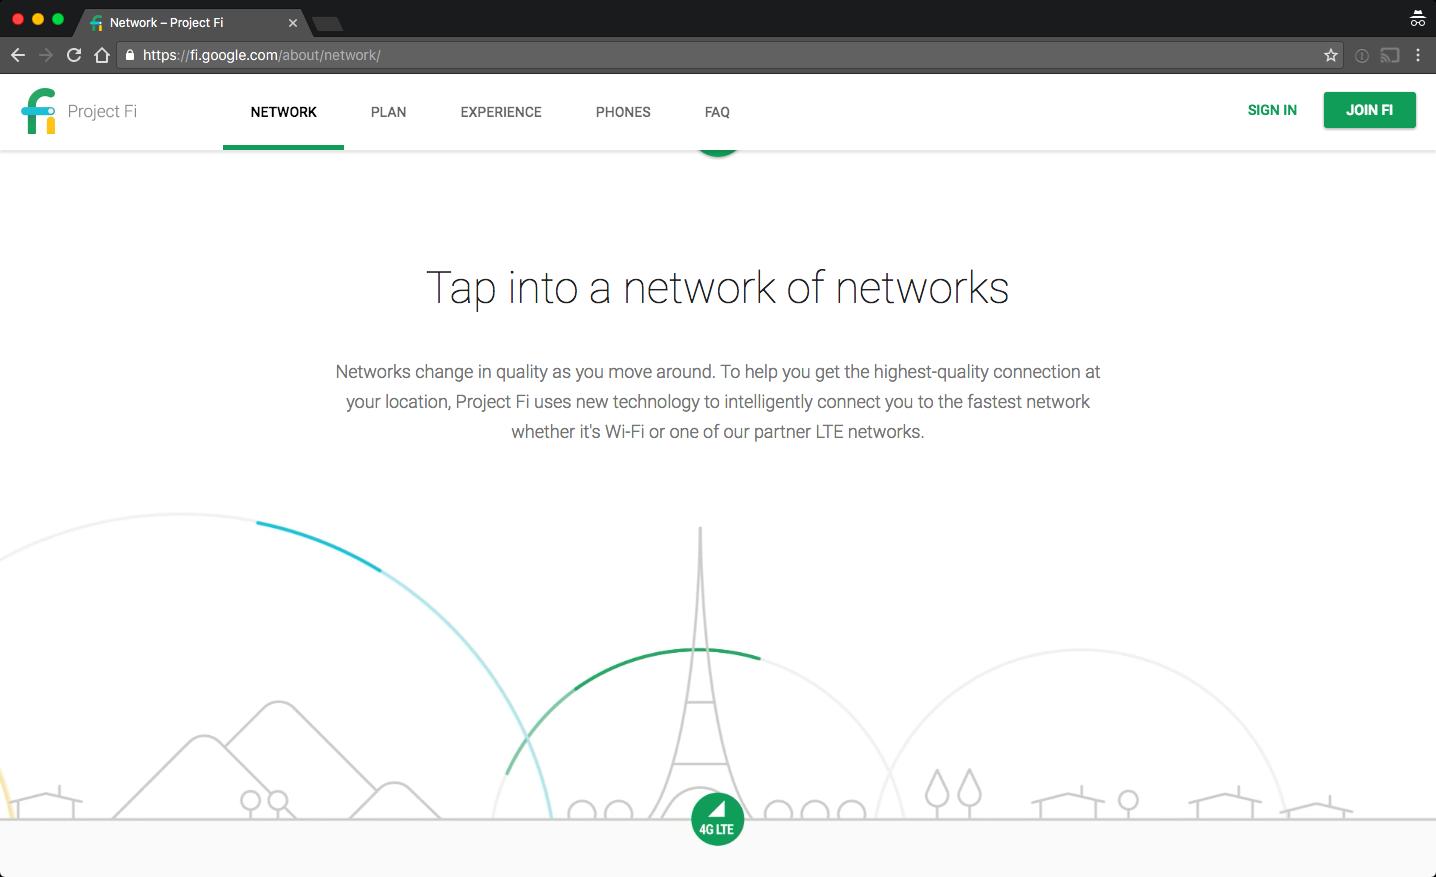 network-project-fi-2016-10-02-02-47-09